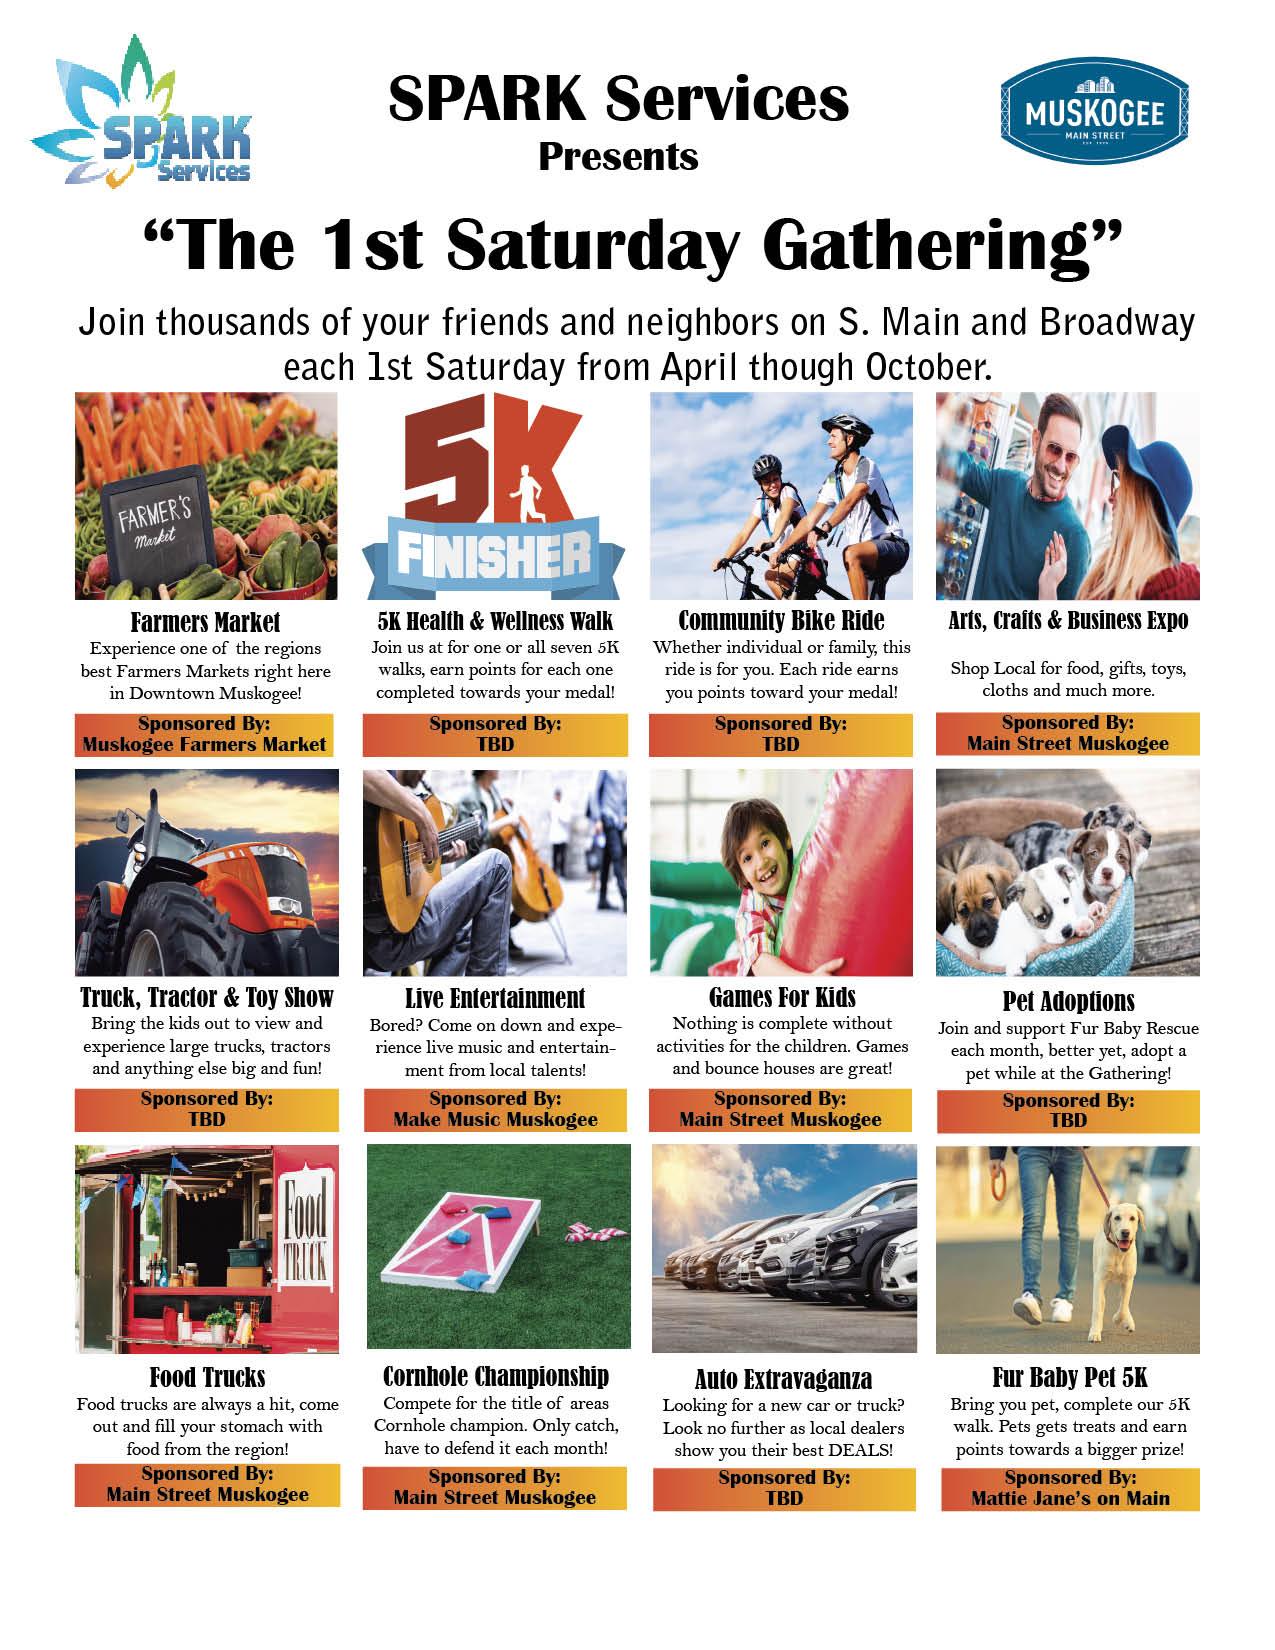 The 1st Saturday Gathering.jpg